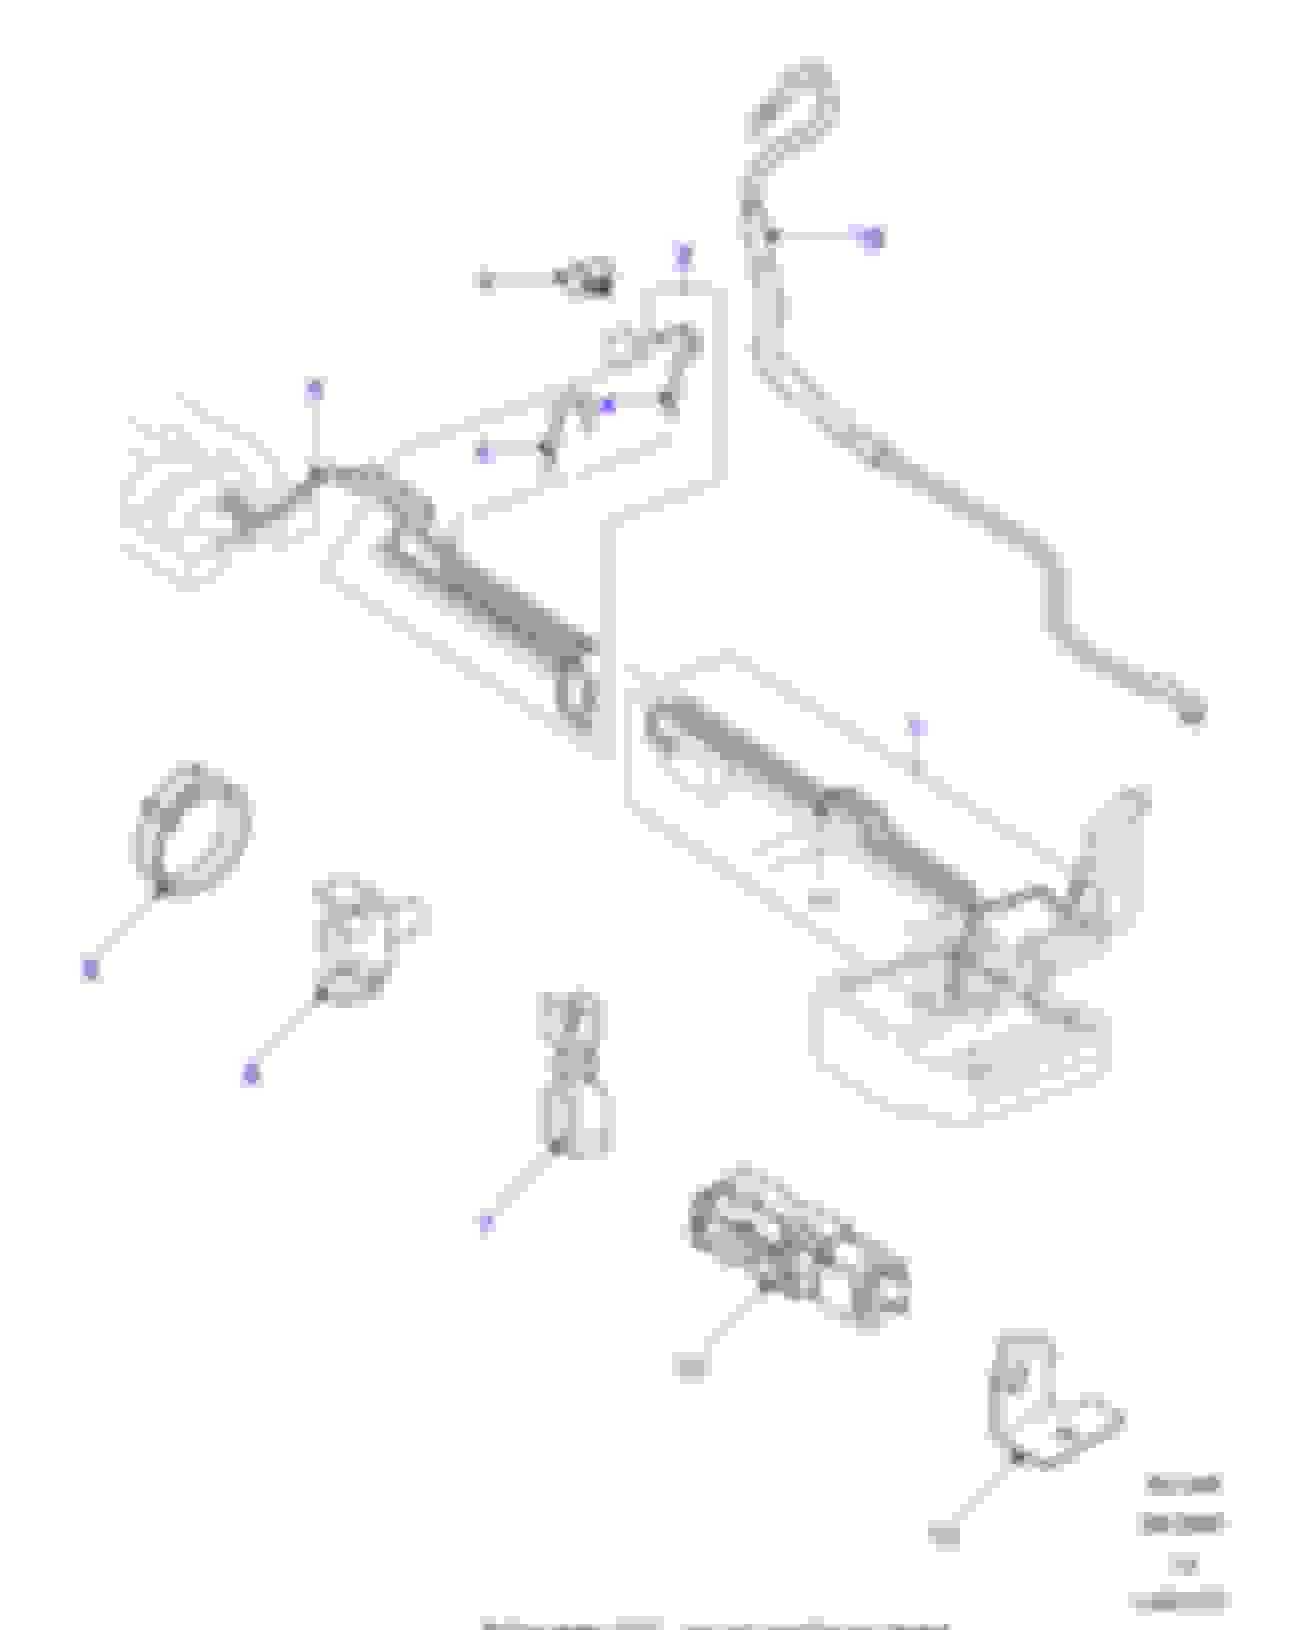 Range Rover Evoque Purge Valve